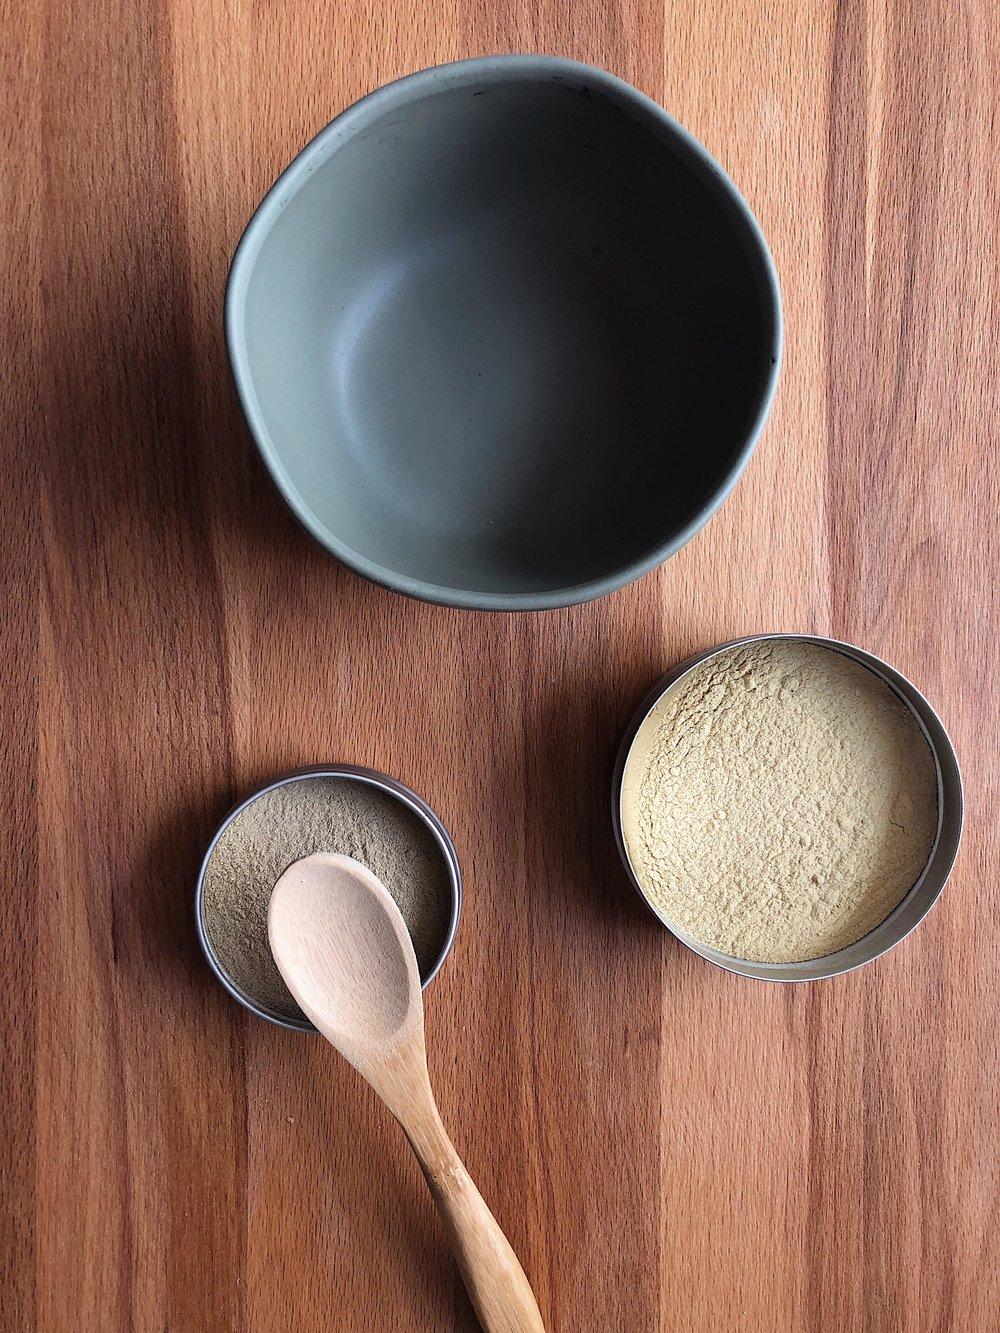 Bowl, Shatavari, Ashwagandha & Wooden Spoon